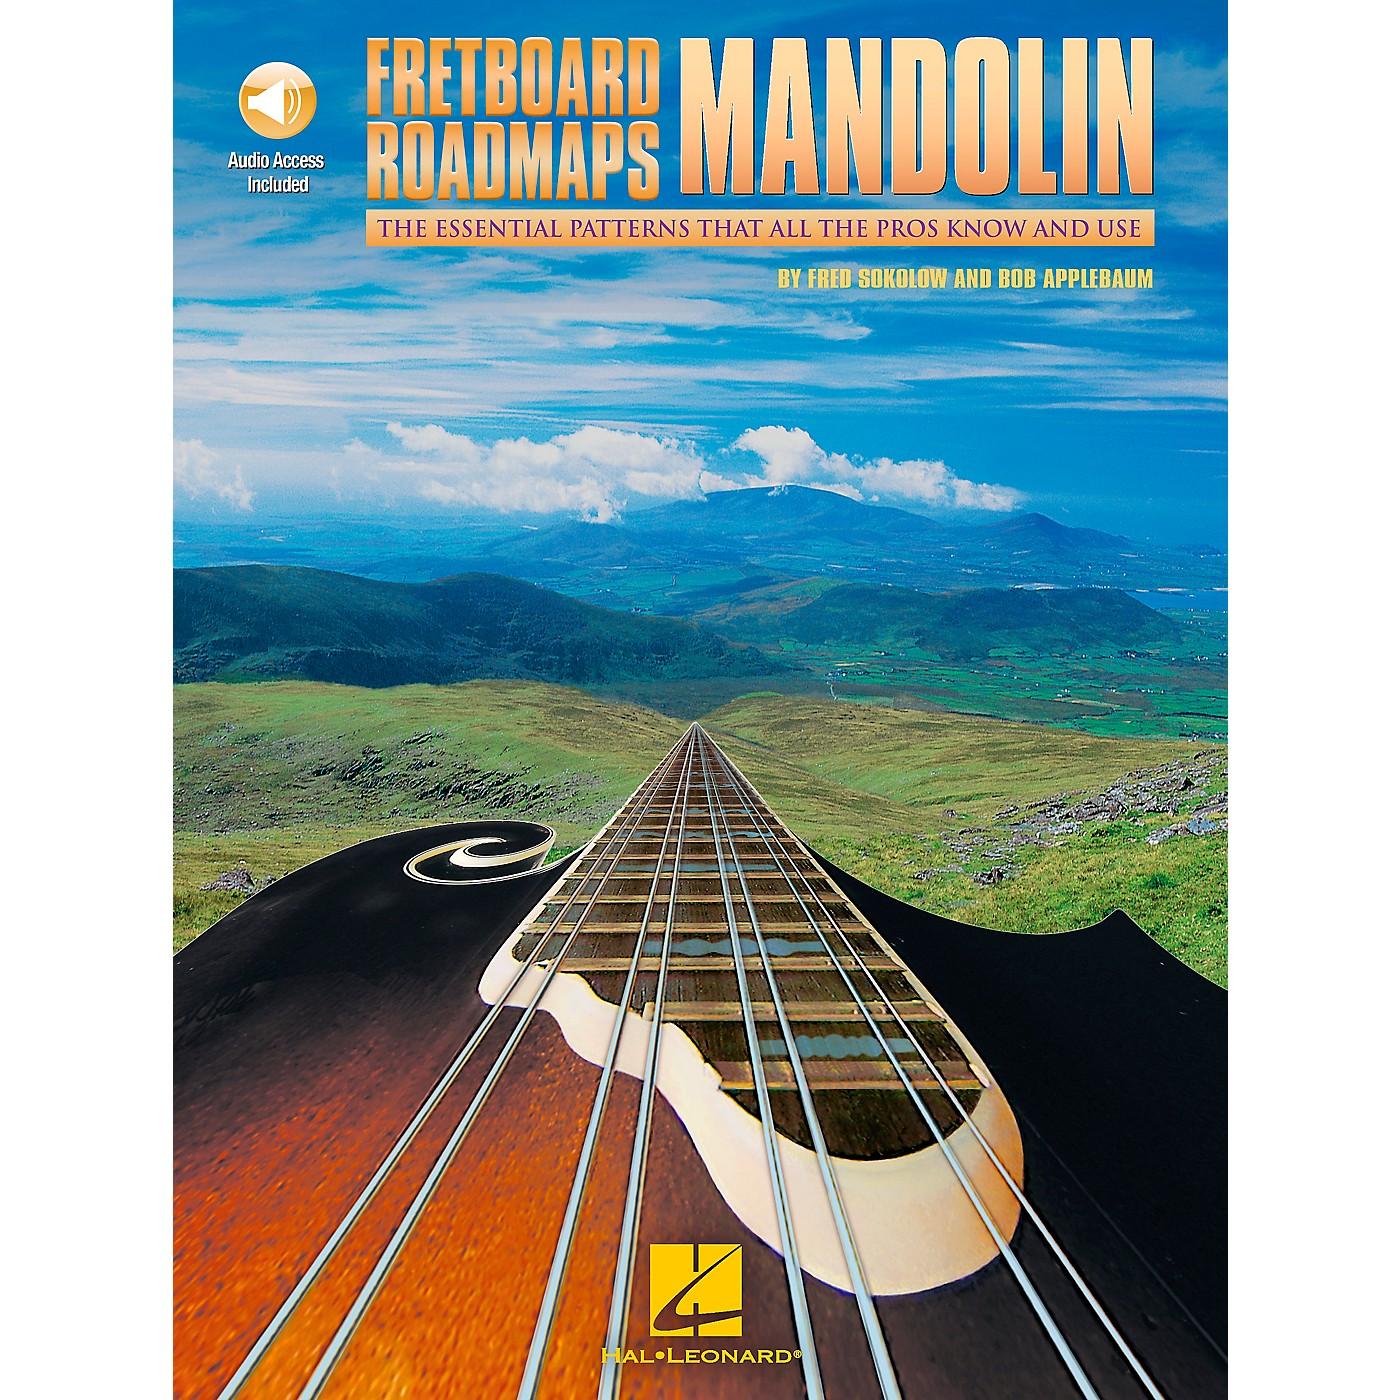 Hal Leonard Fretboard Roadmaps Mandolin (Book/CD) thumbnail